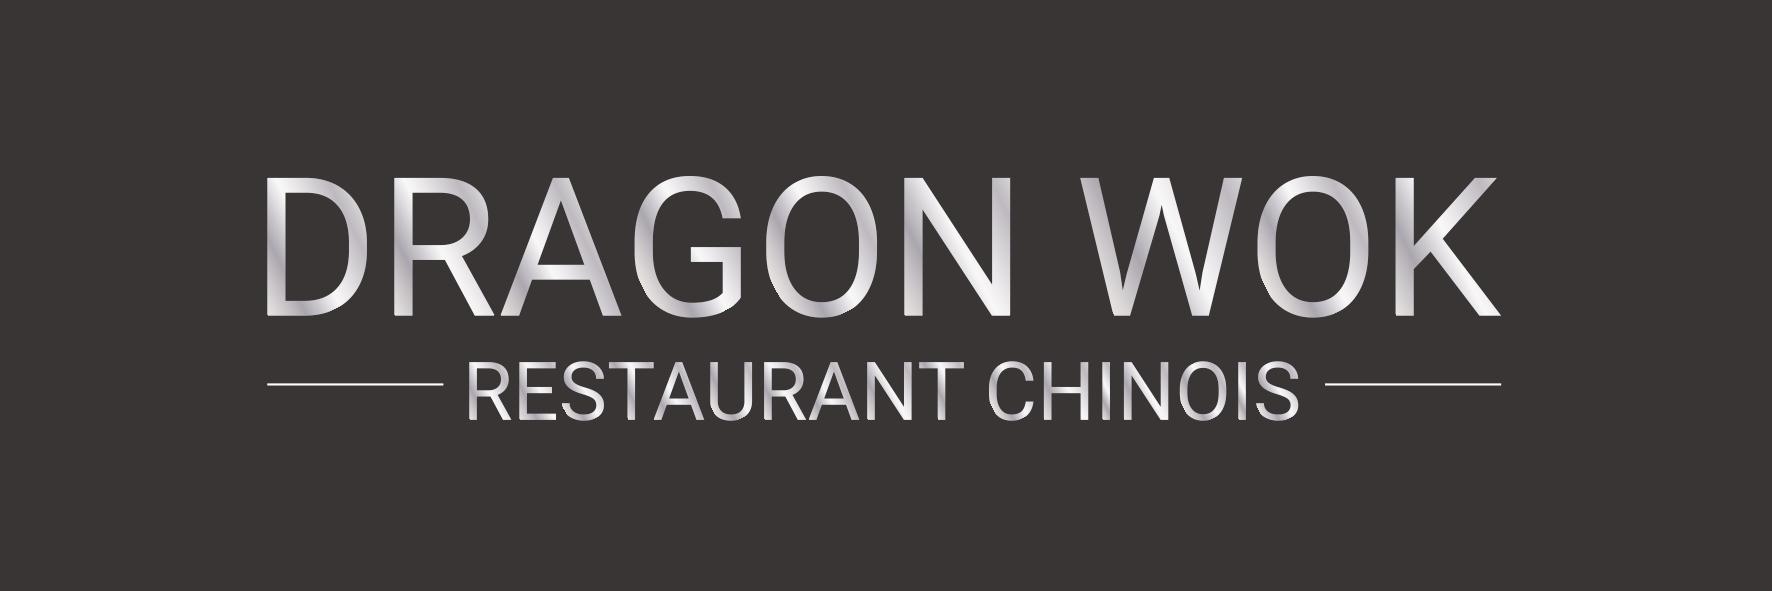 http://usepmm.fr/wp-content/uploads/2021/03/Dragon-wok-gris_page-0001.jpg